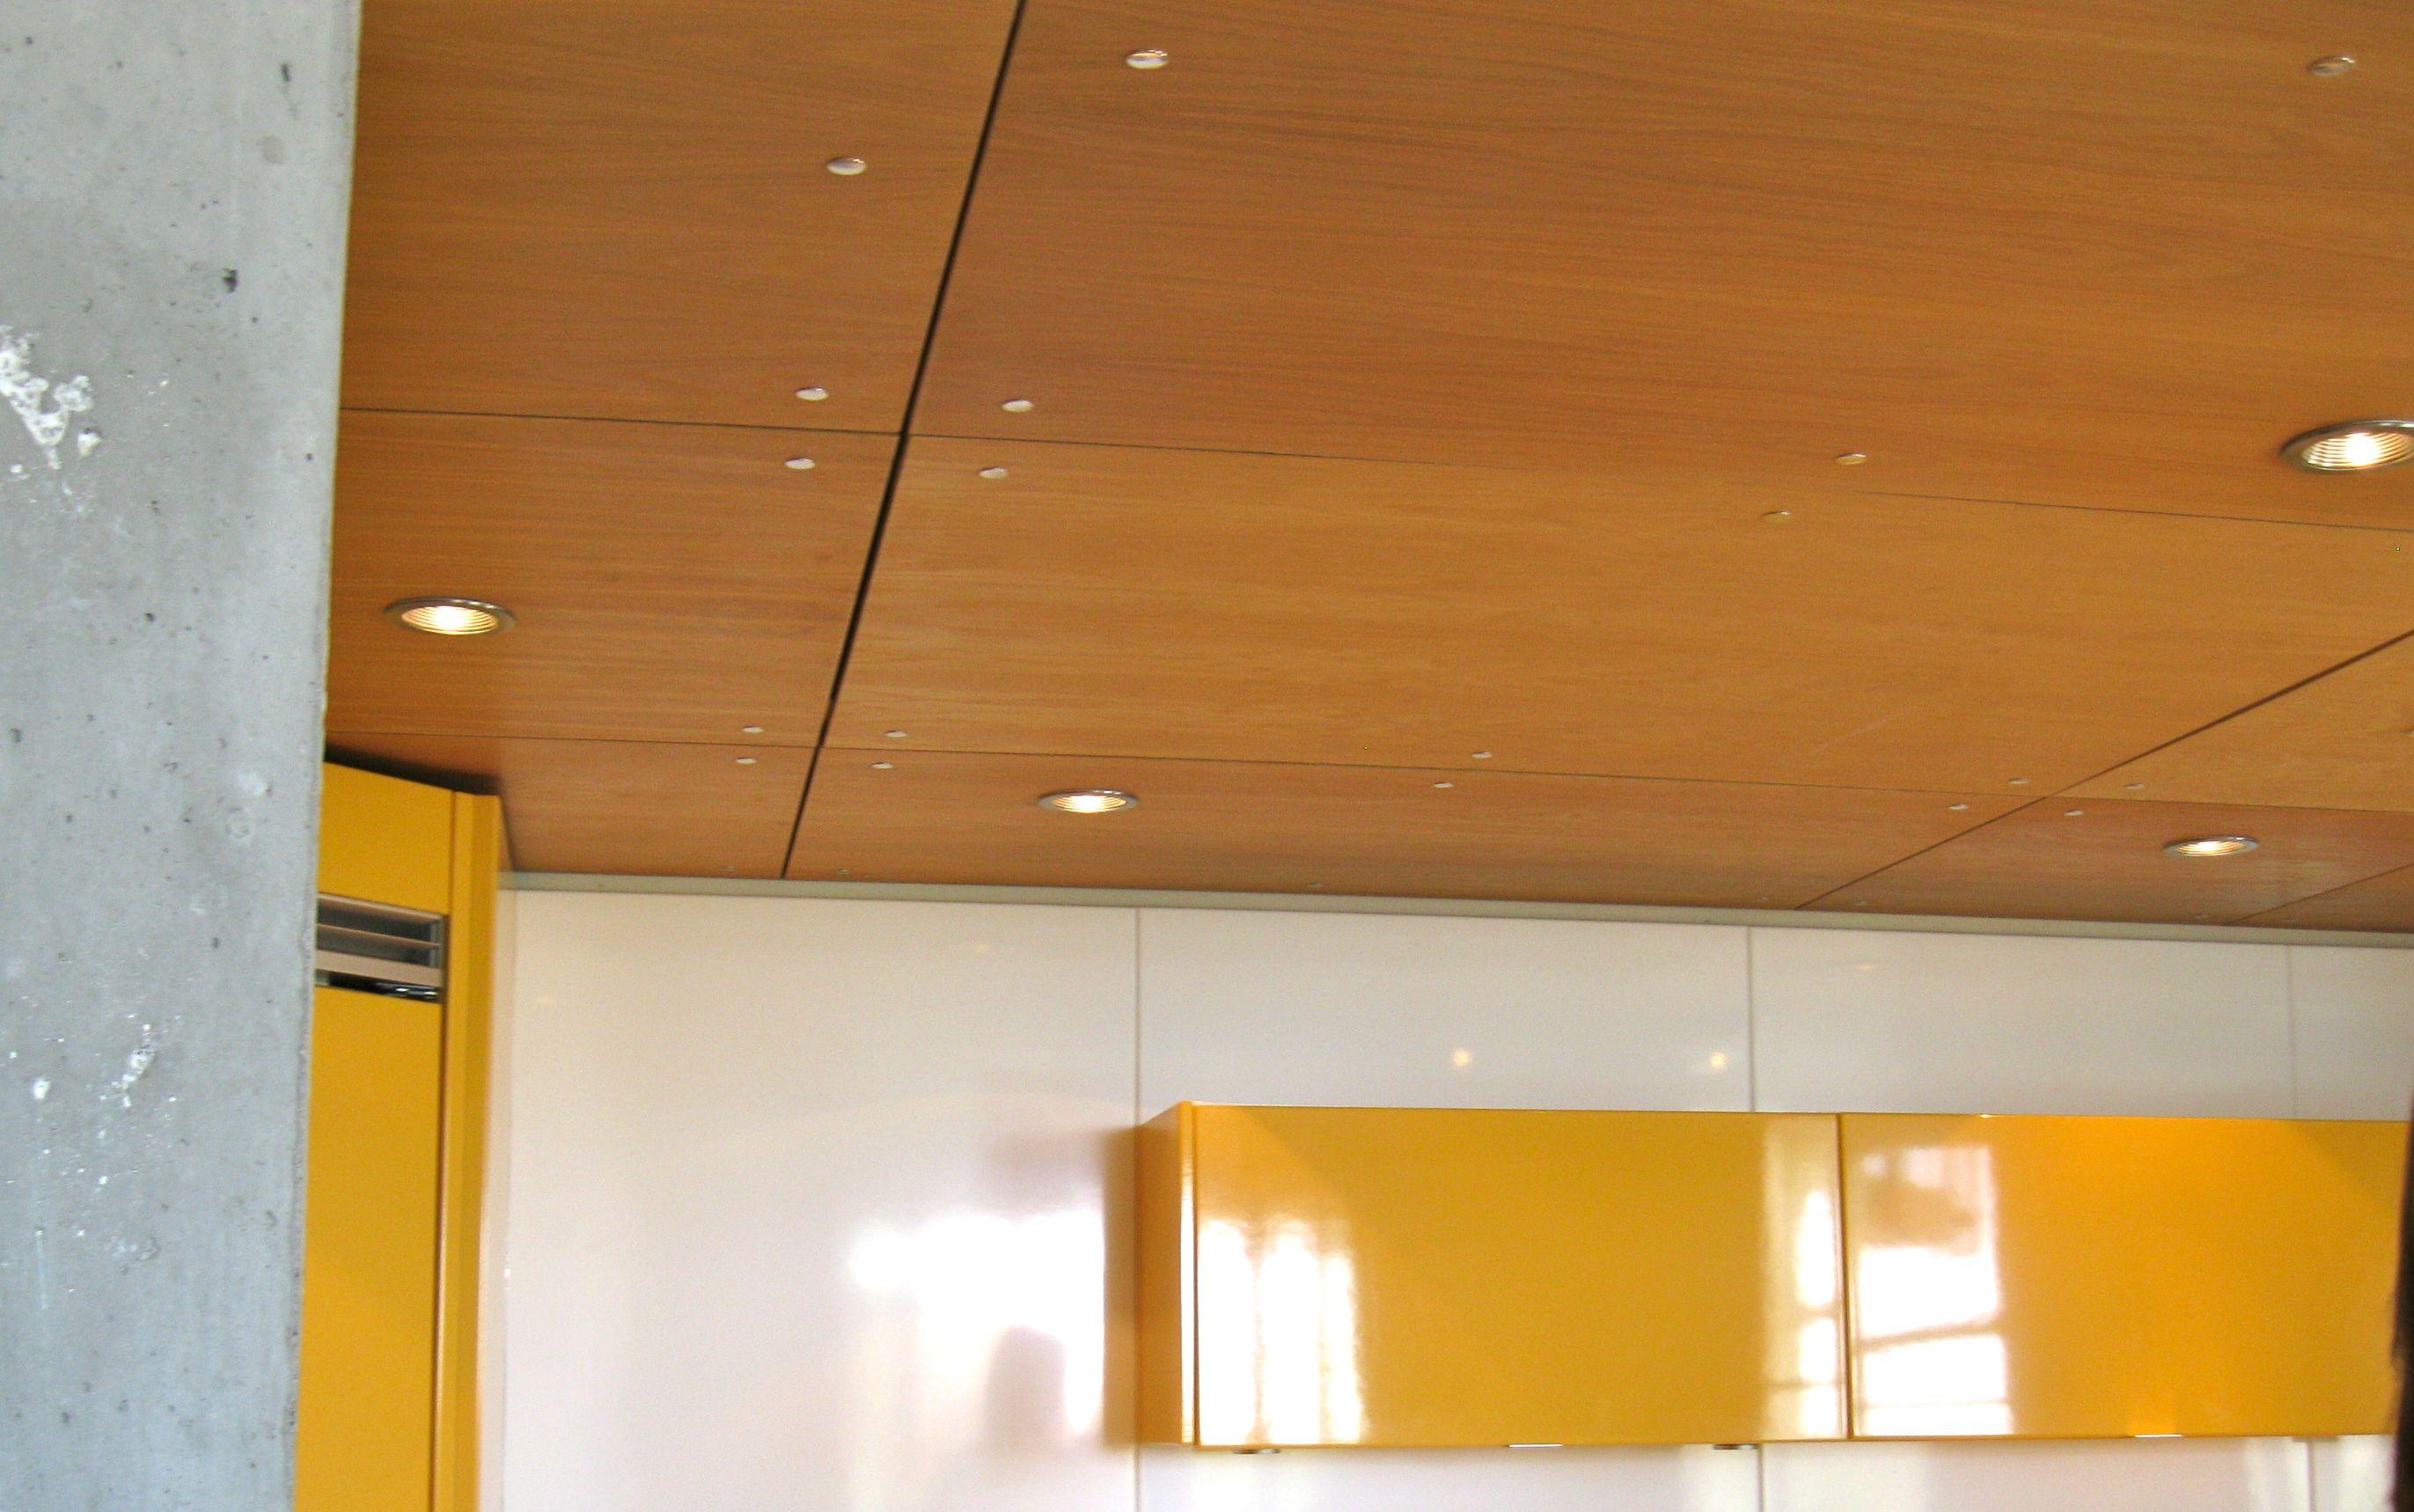 Style Ceilings Tiles